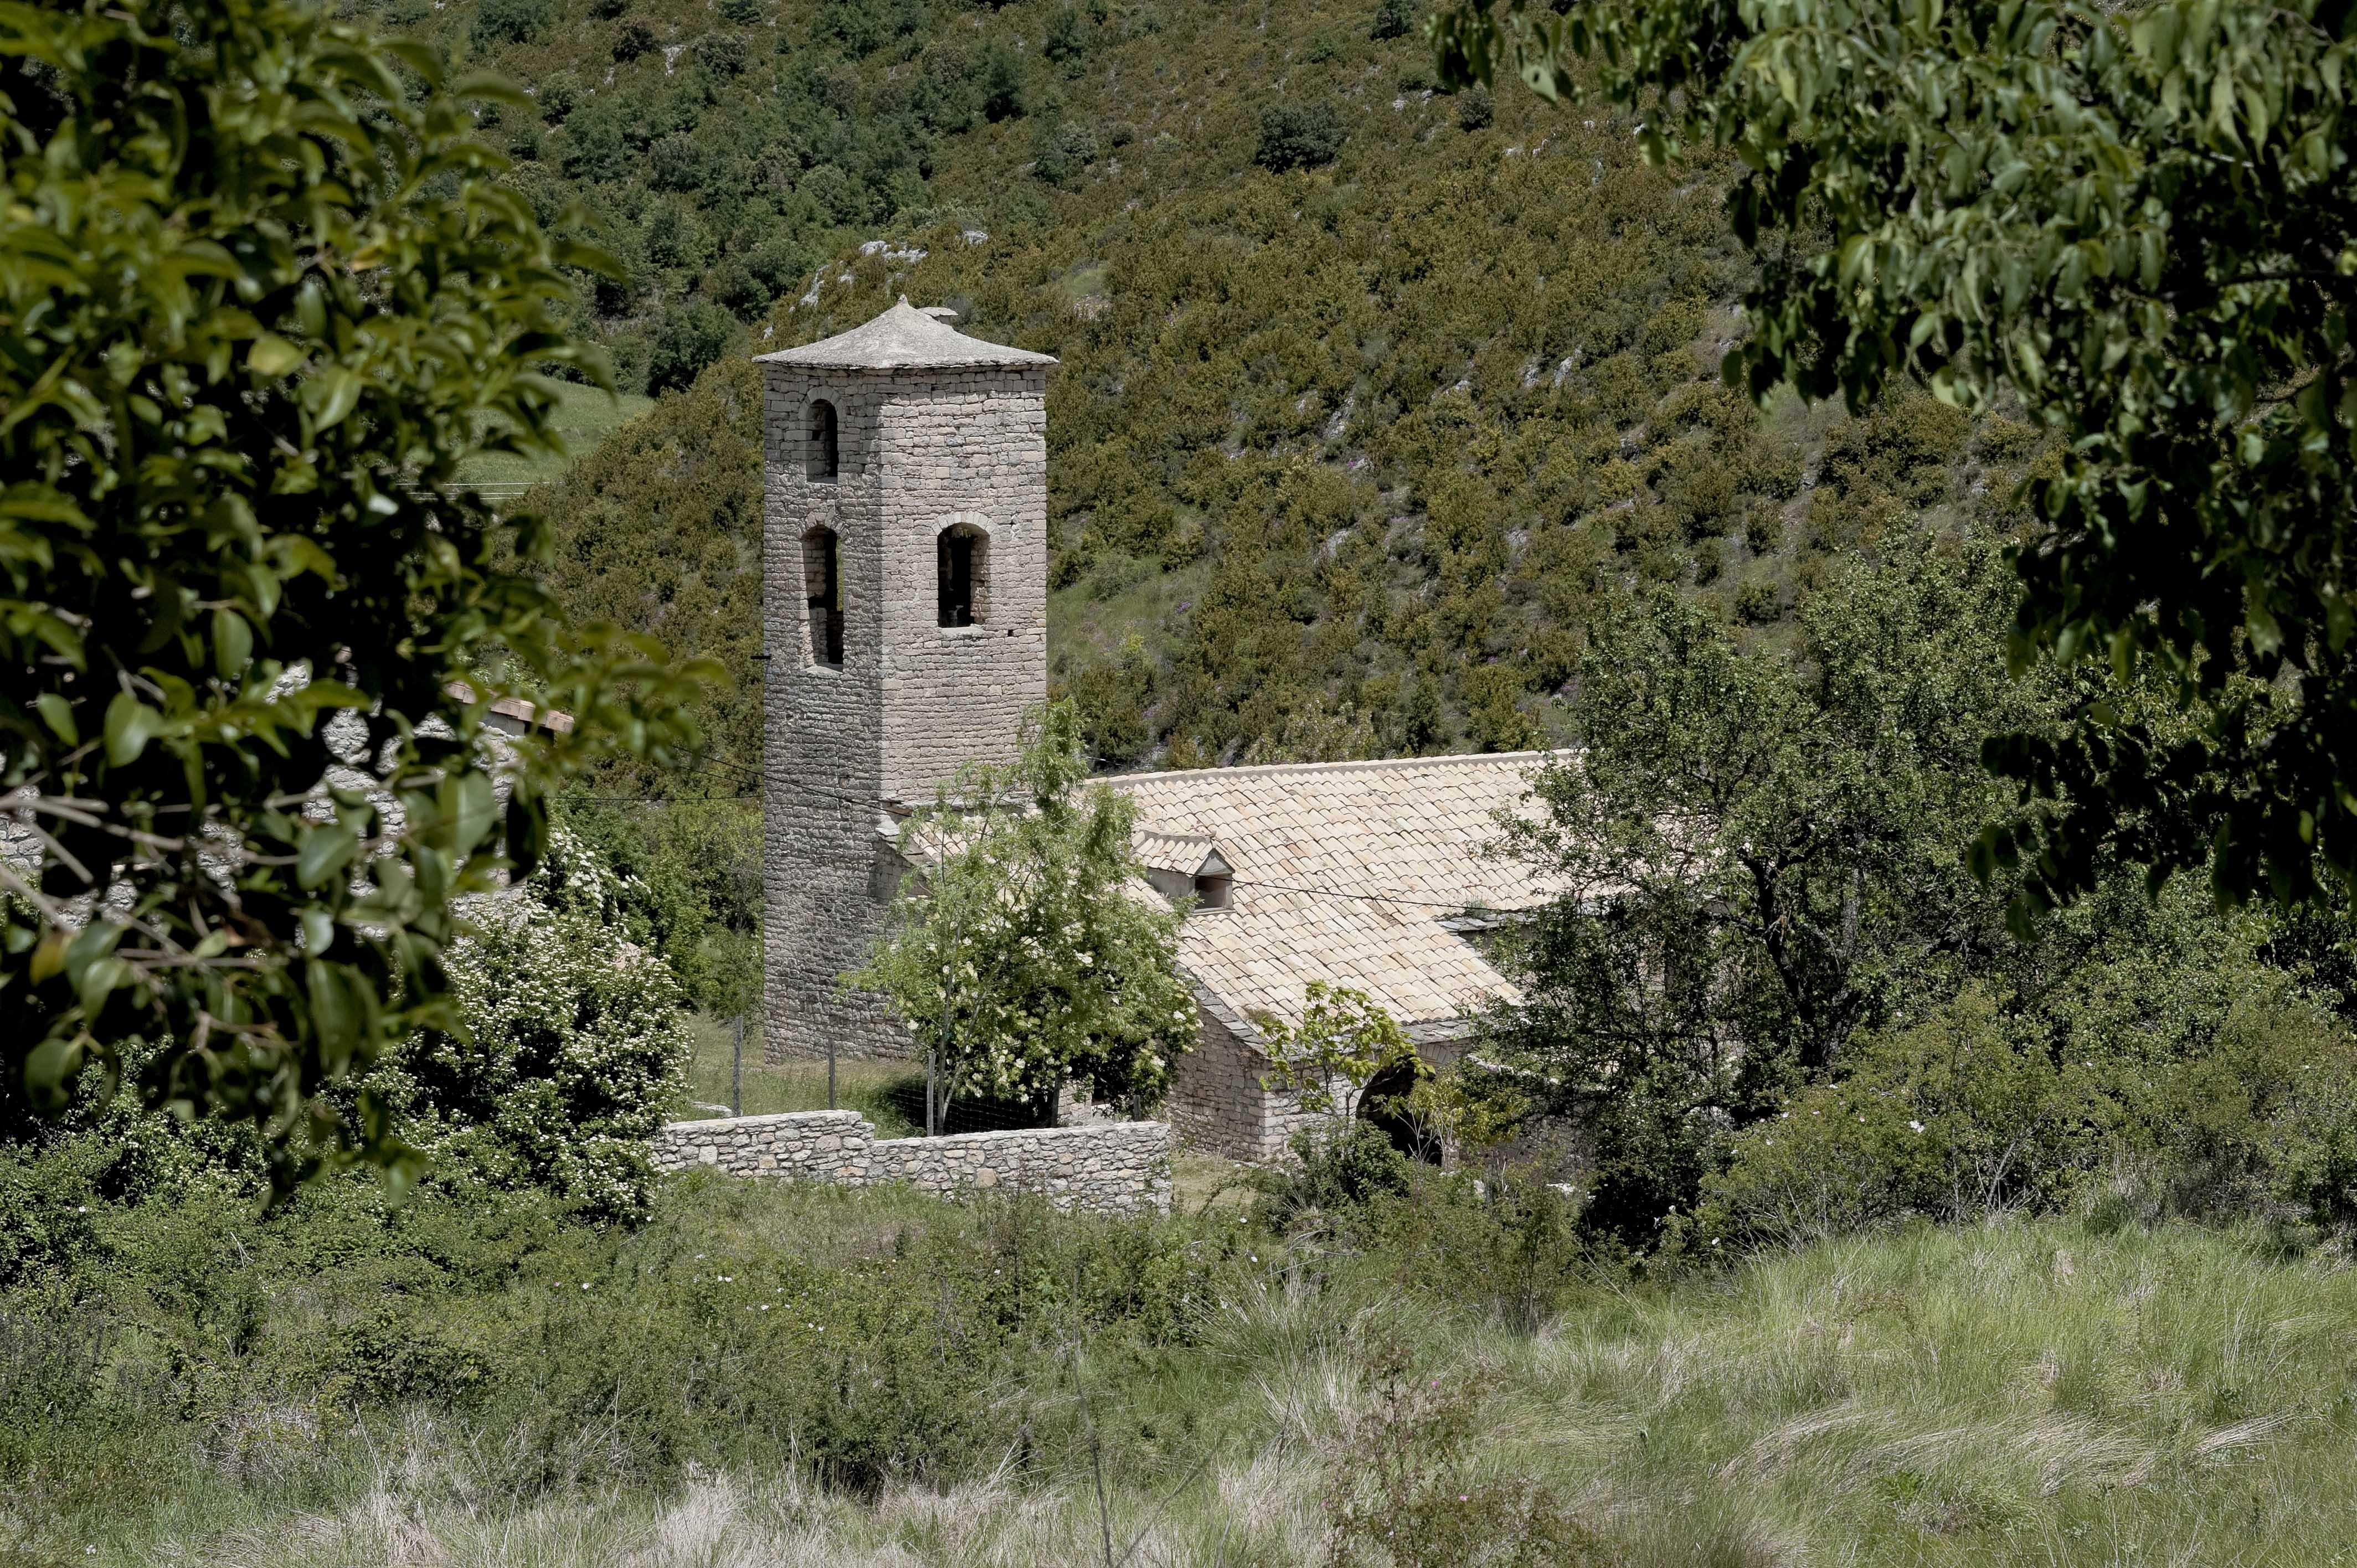 6806_Sarsa de Surta (Sobrarbe)